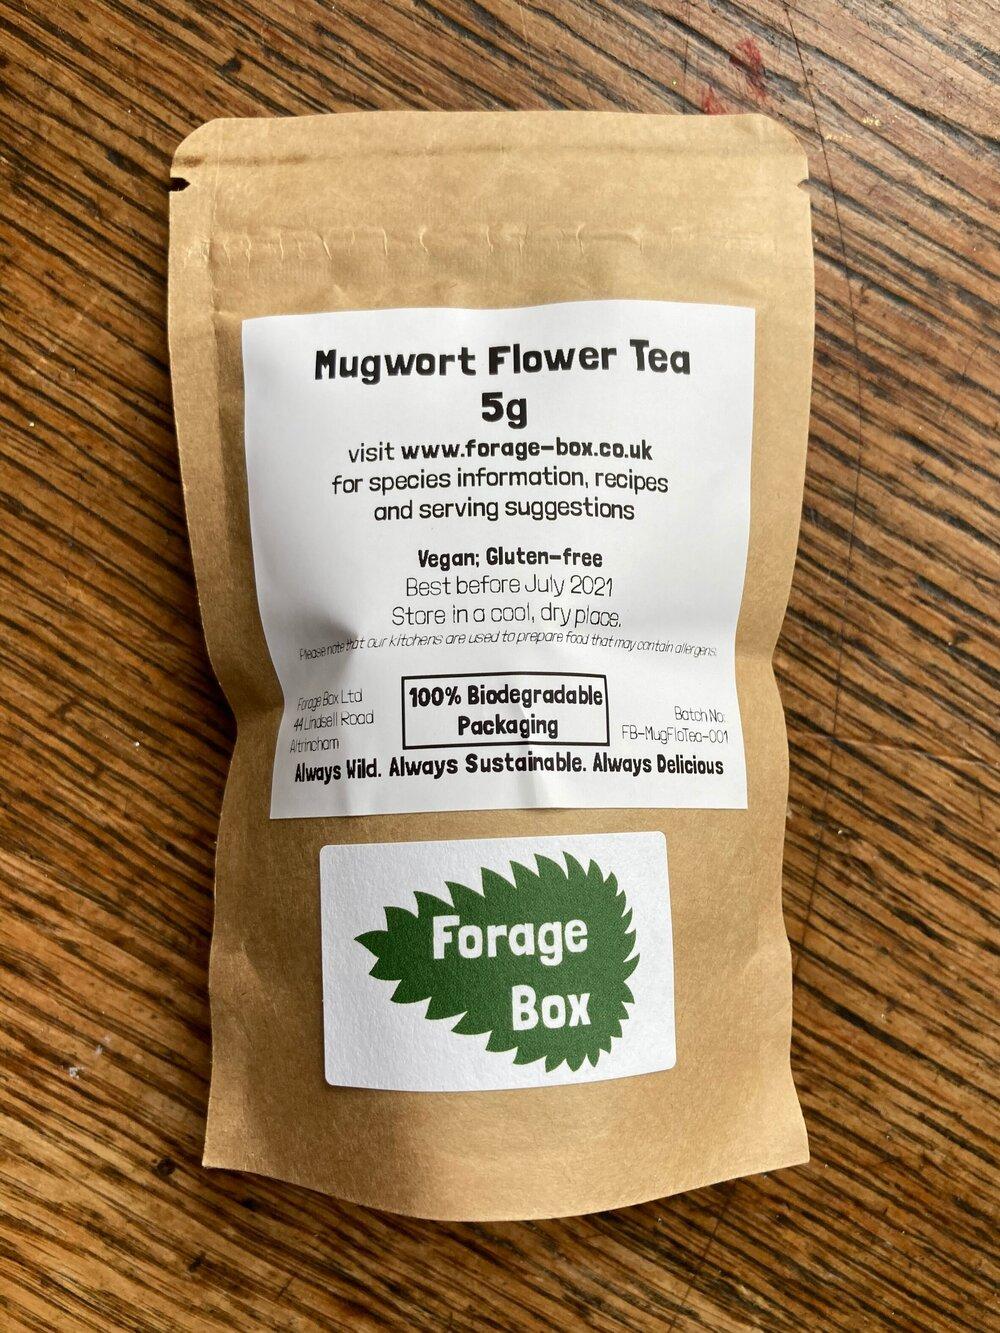 Mugwort Flower Tea